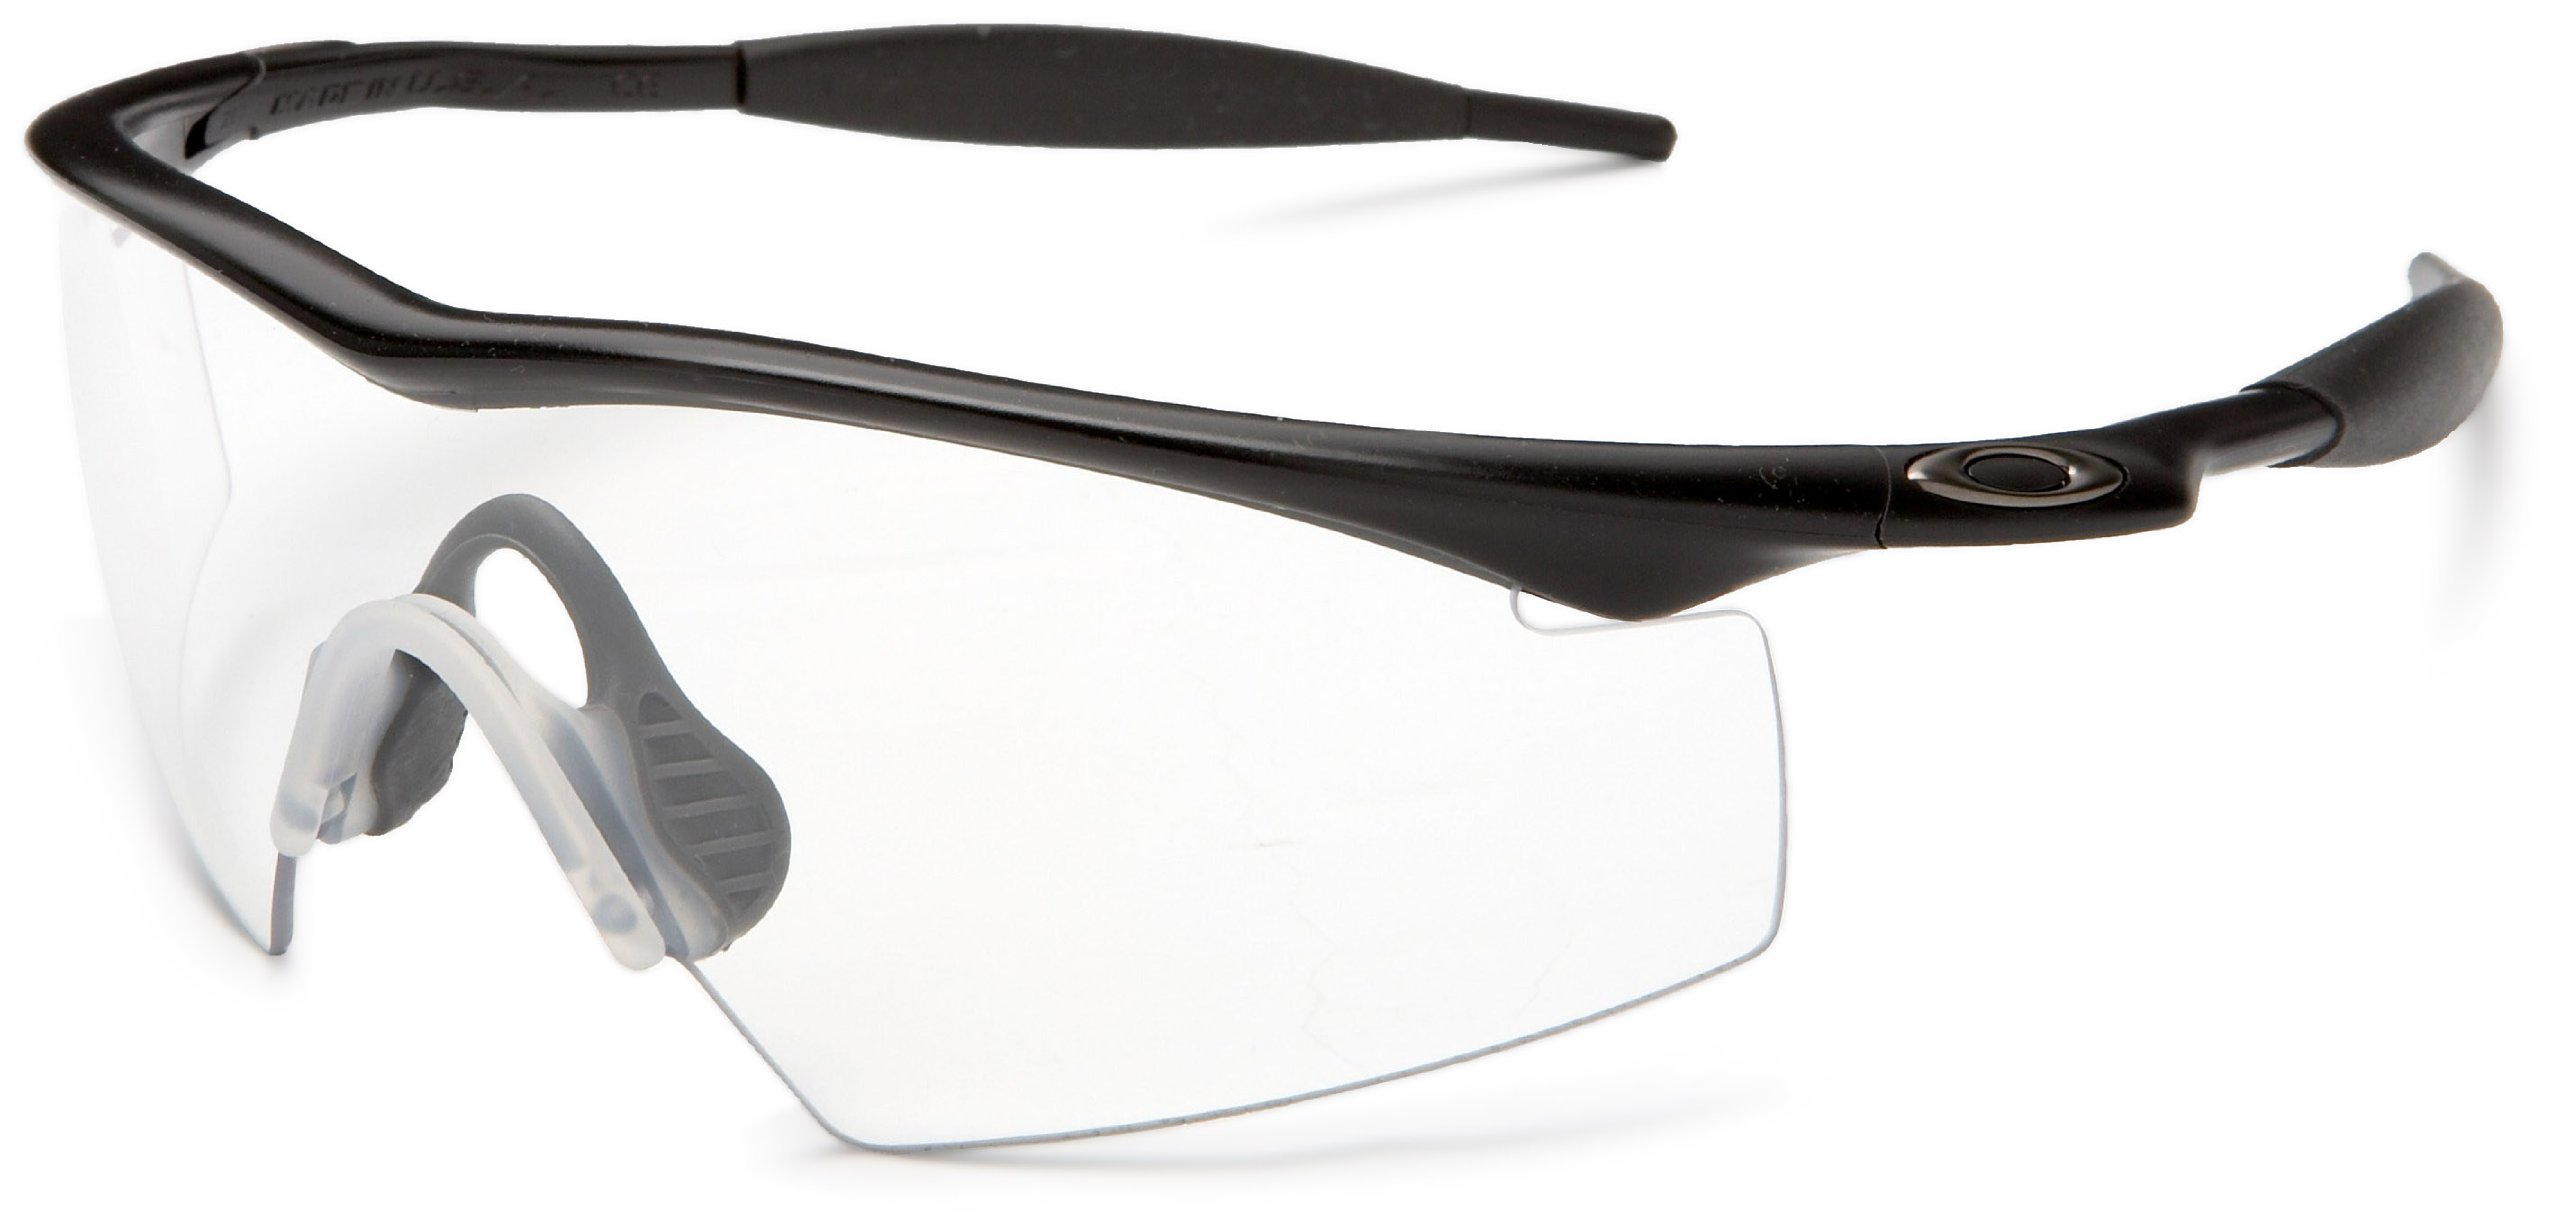 520d849e43e cheapest oakley men oo9060 ballistic m frame sunglasses 34mm 49f25 54736